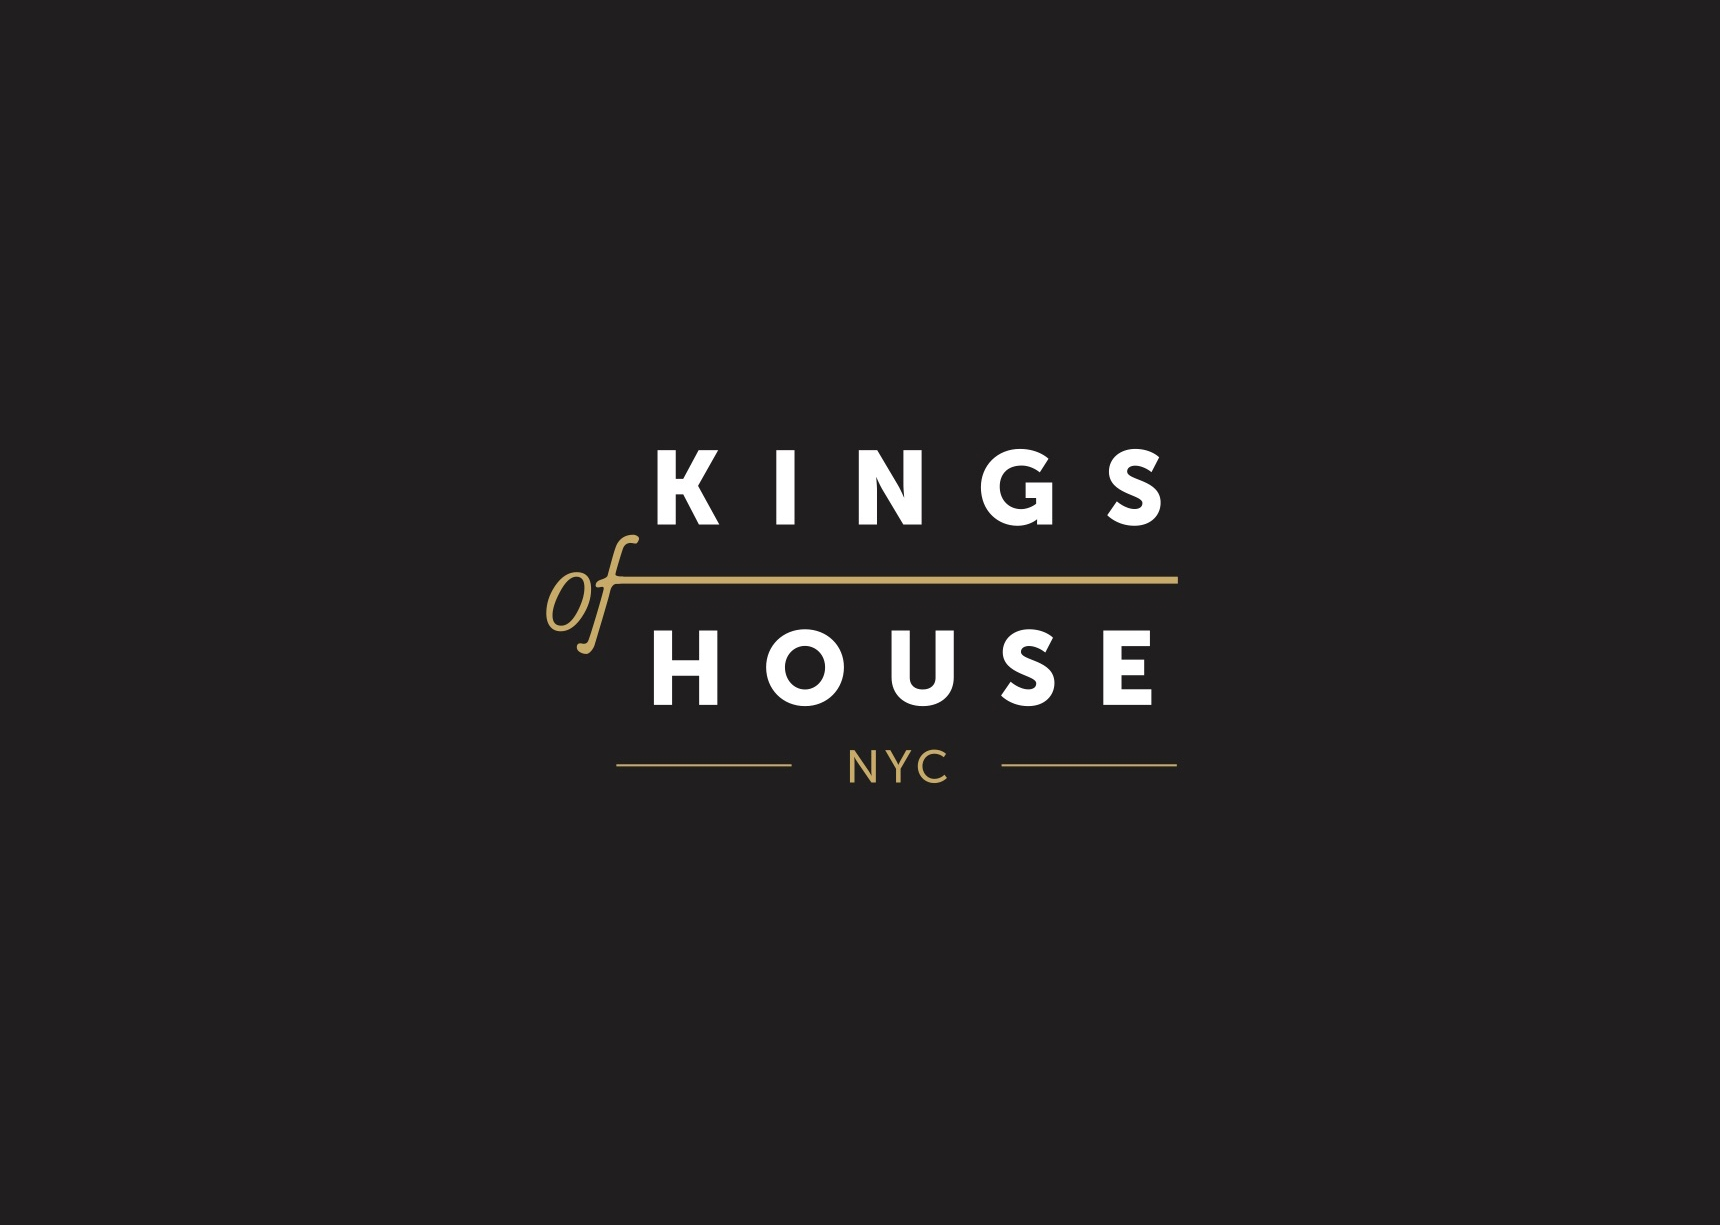 Kings of House NYC (Louie Vega & David Morales) talk Ibiza